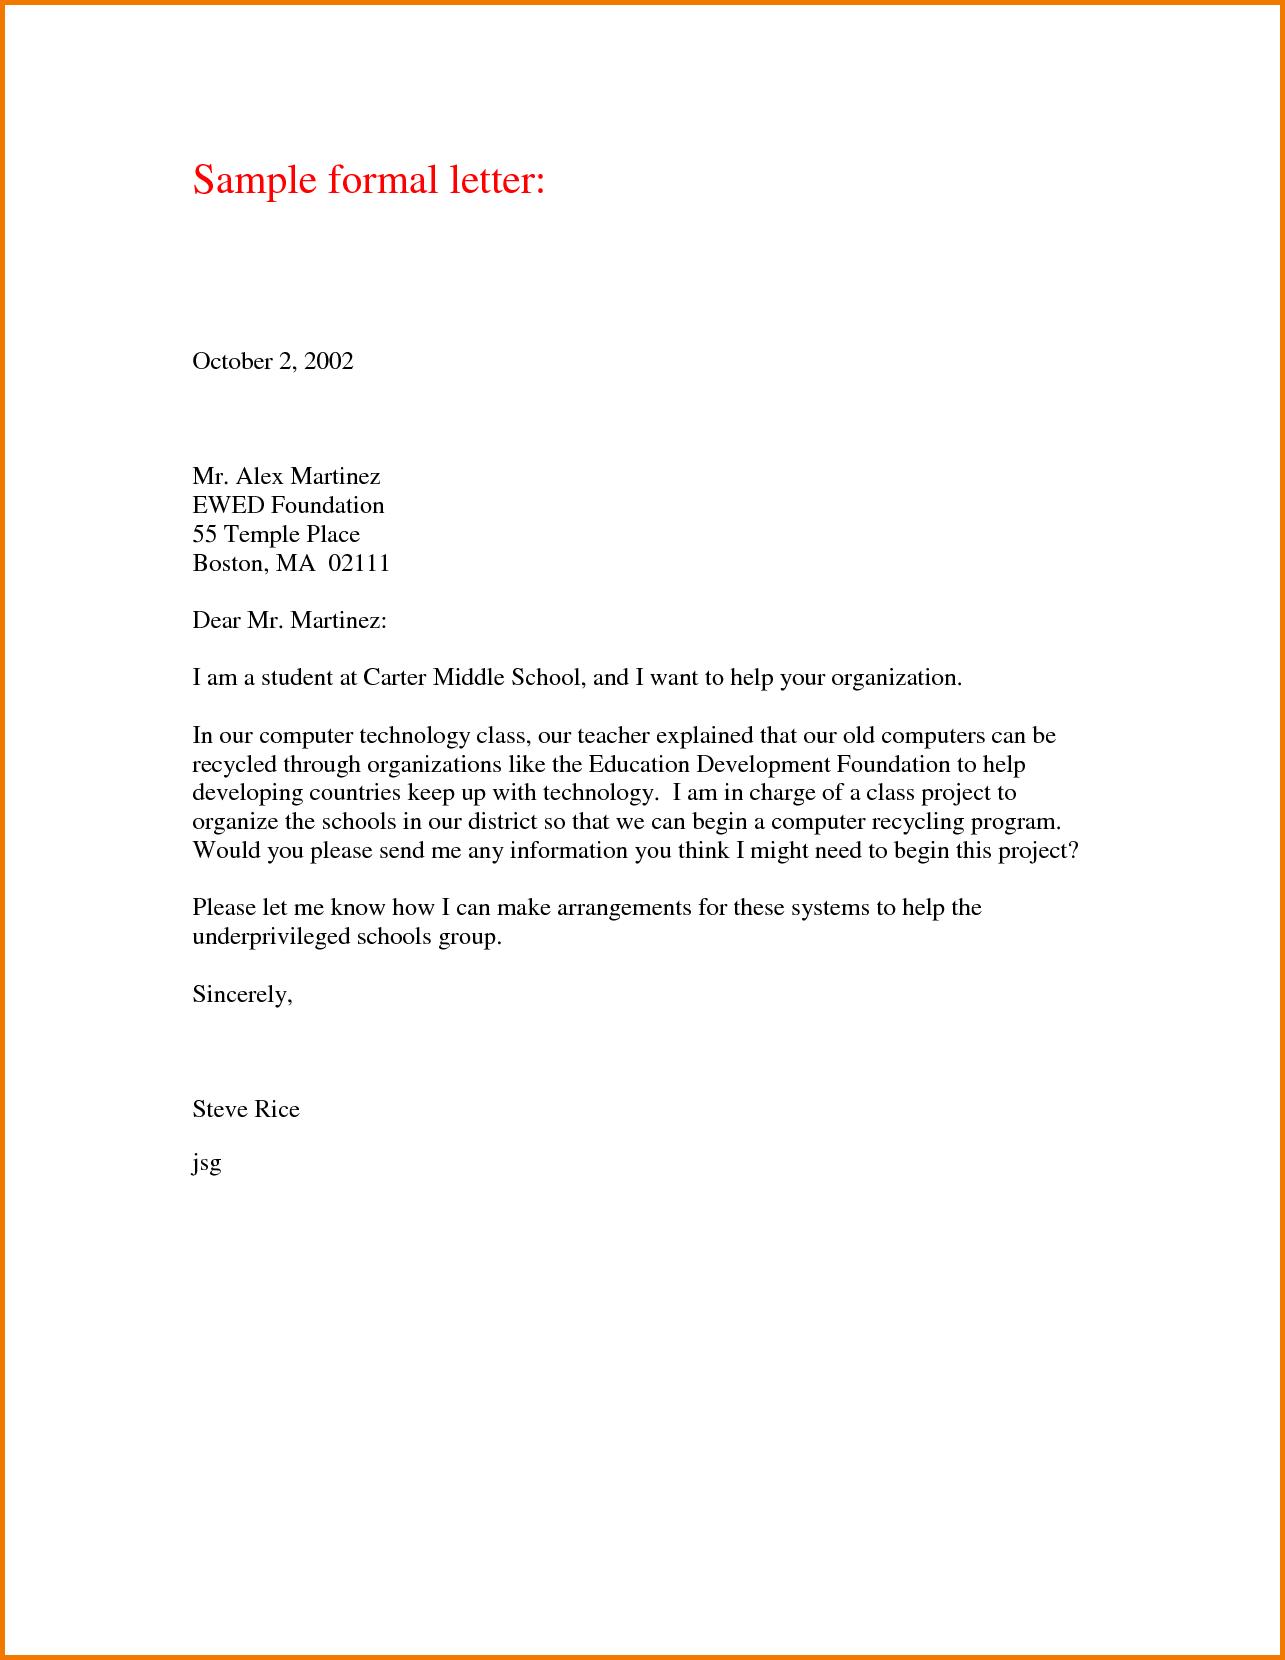 Thanking letter format sample formal business samples contract thanking letter format sample formal business samples contract template altavistaventures Images